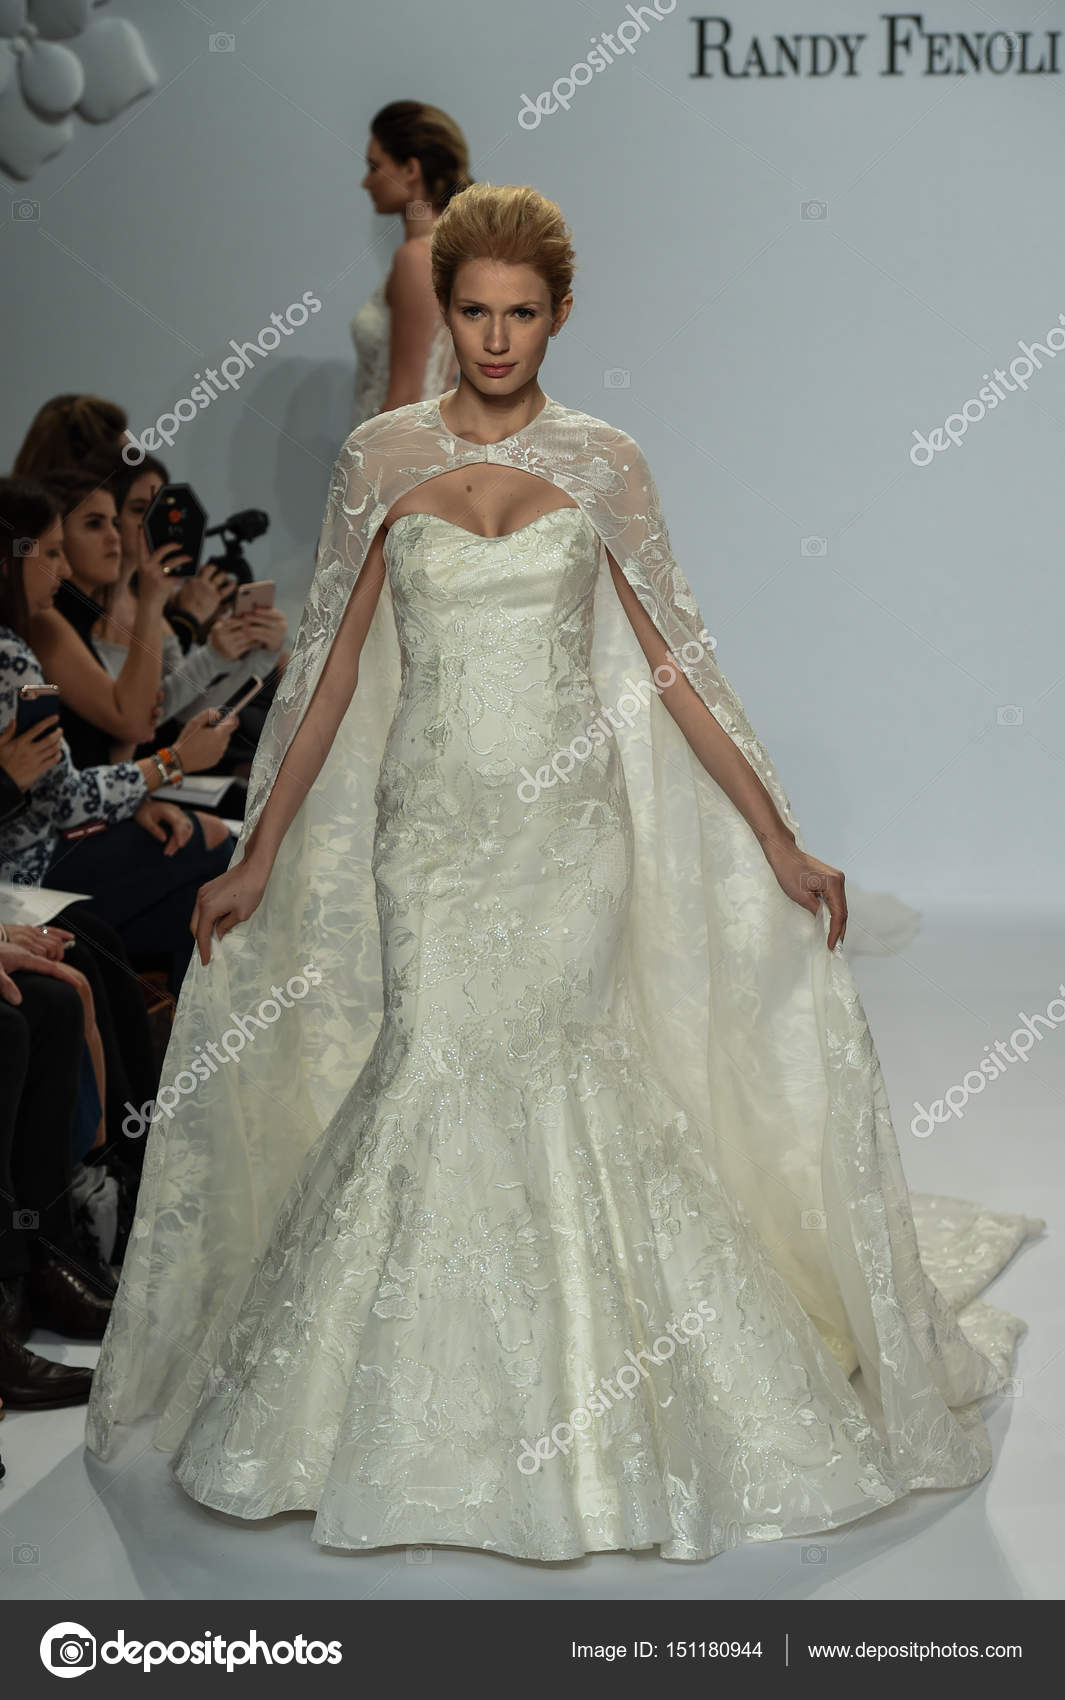 Voir La Randy Fenoli Bridal Photo éditoriale Fashionstock 151180944